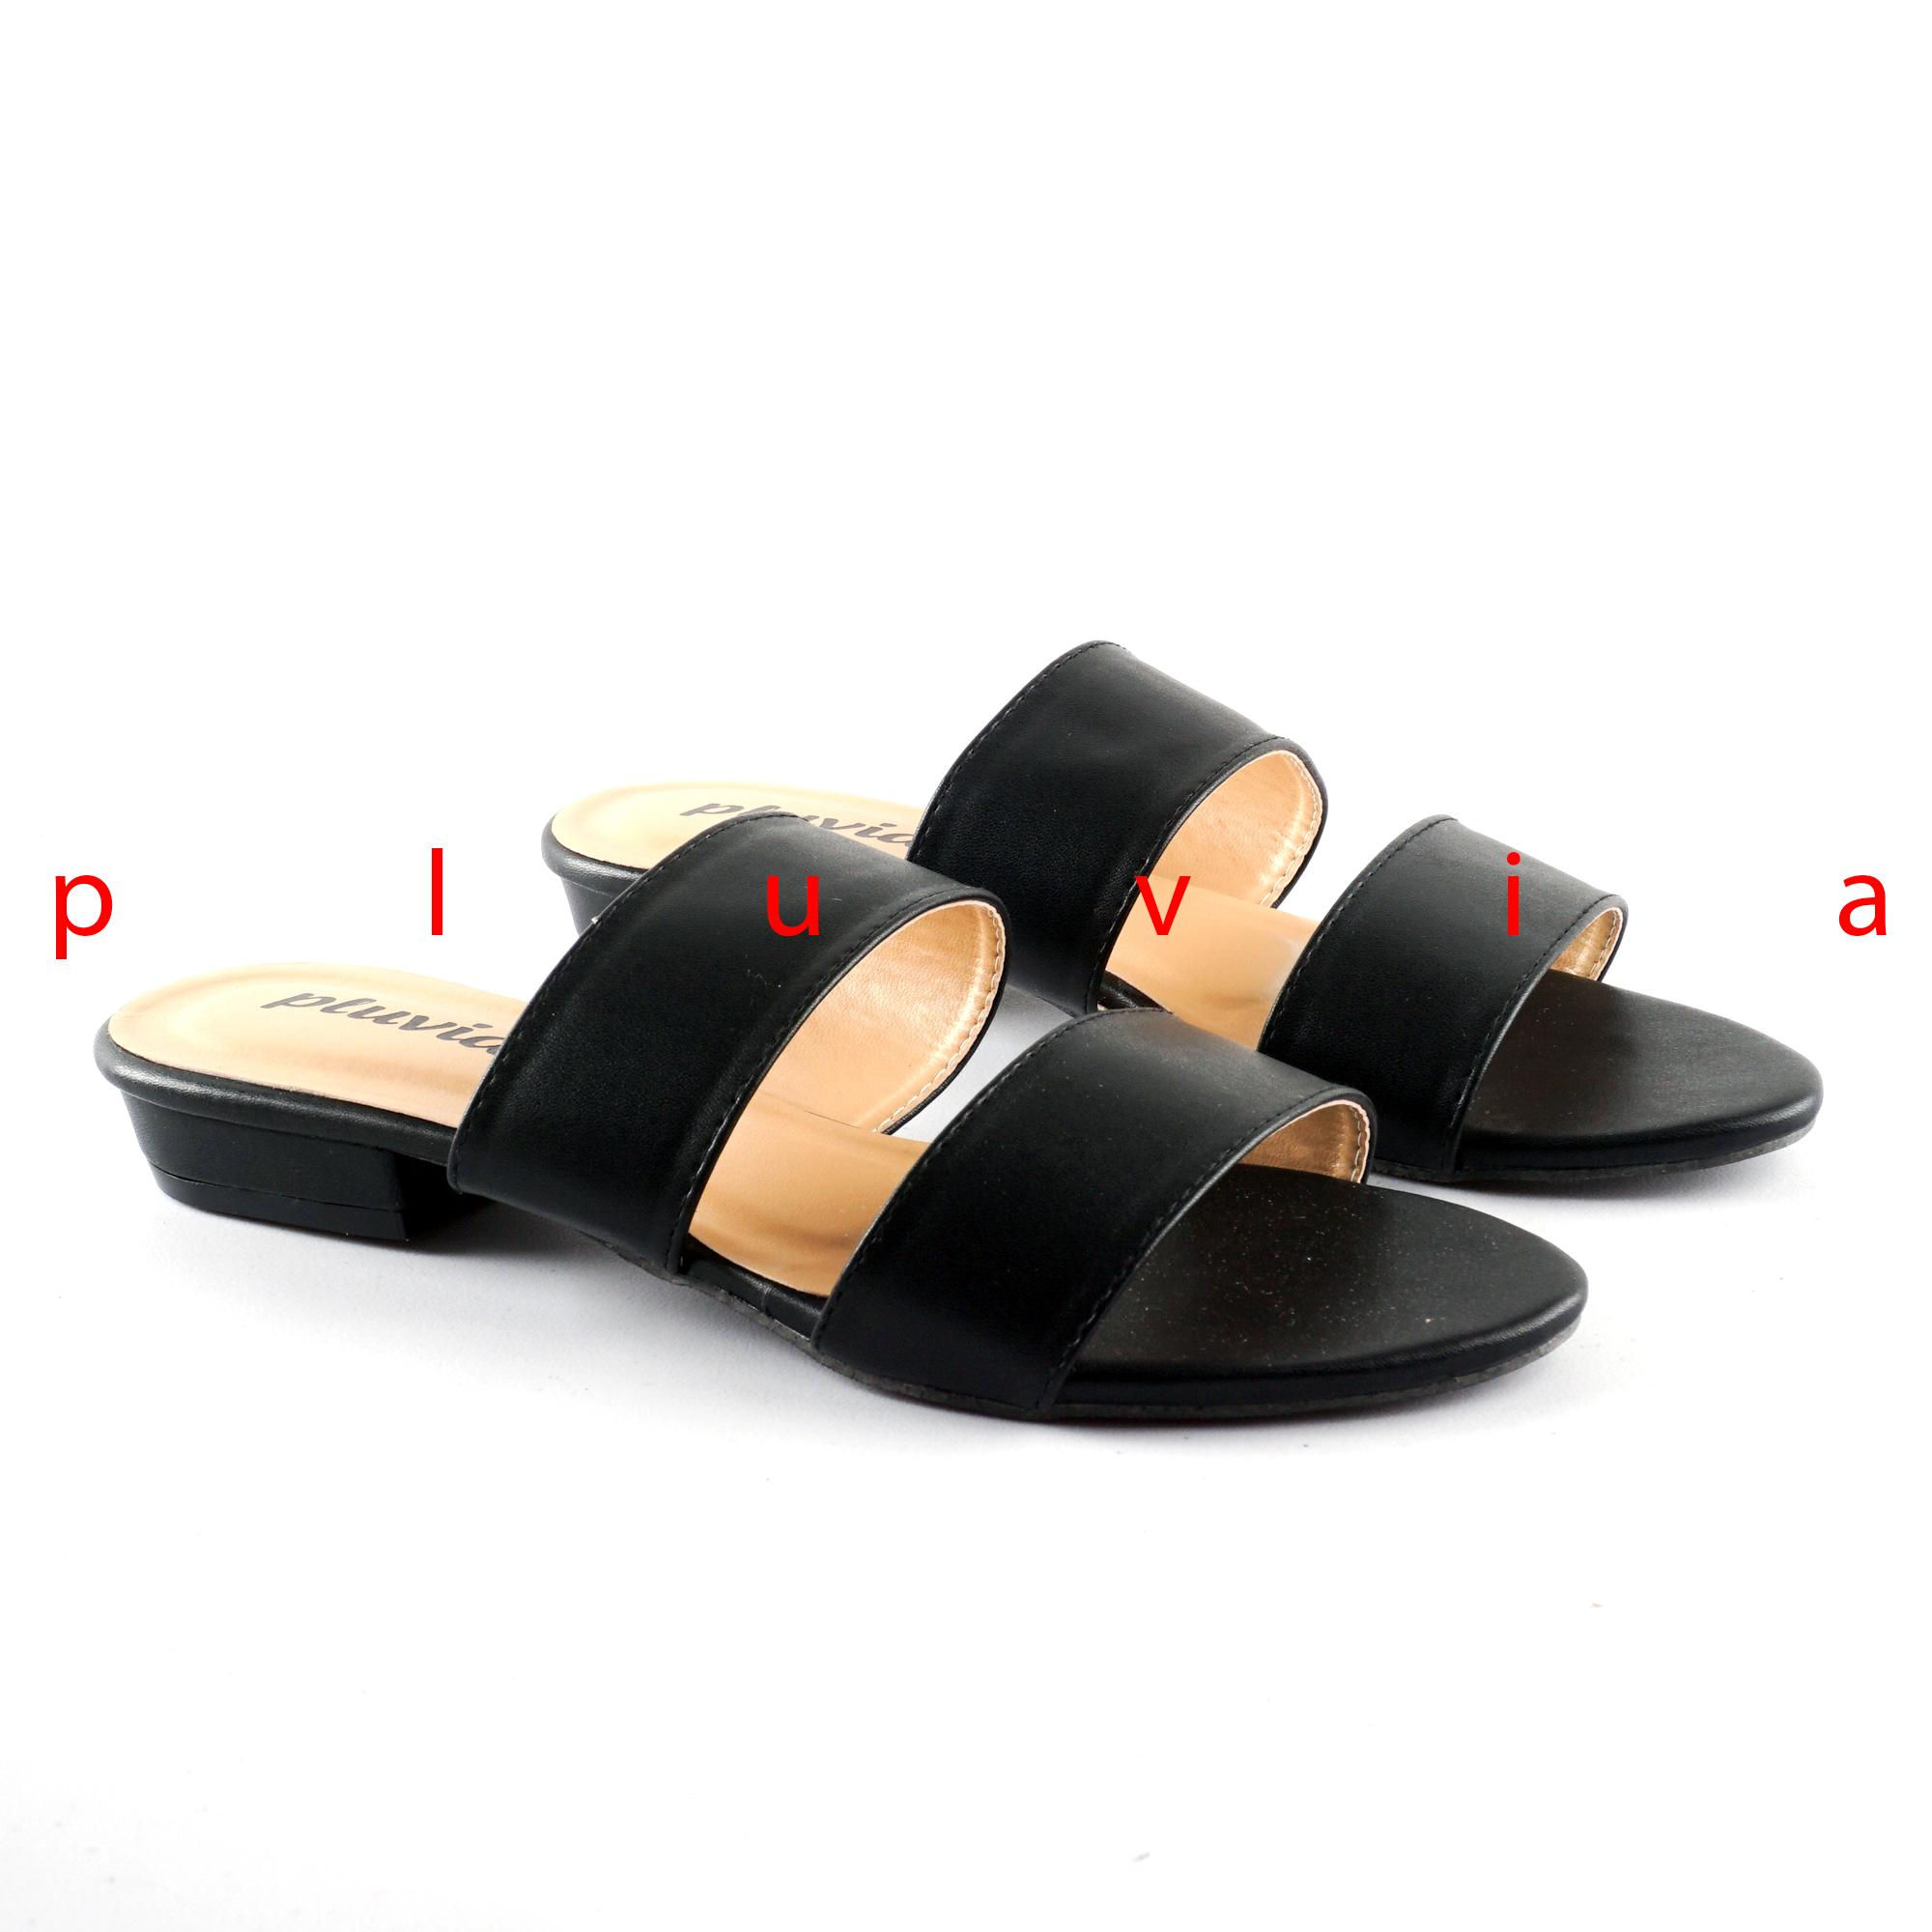 Pluvia - Sandal Sendal Flat Wanita Mules Double Strap DM03 - Hitam